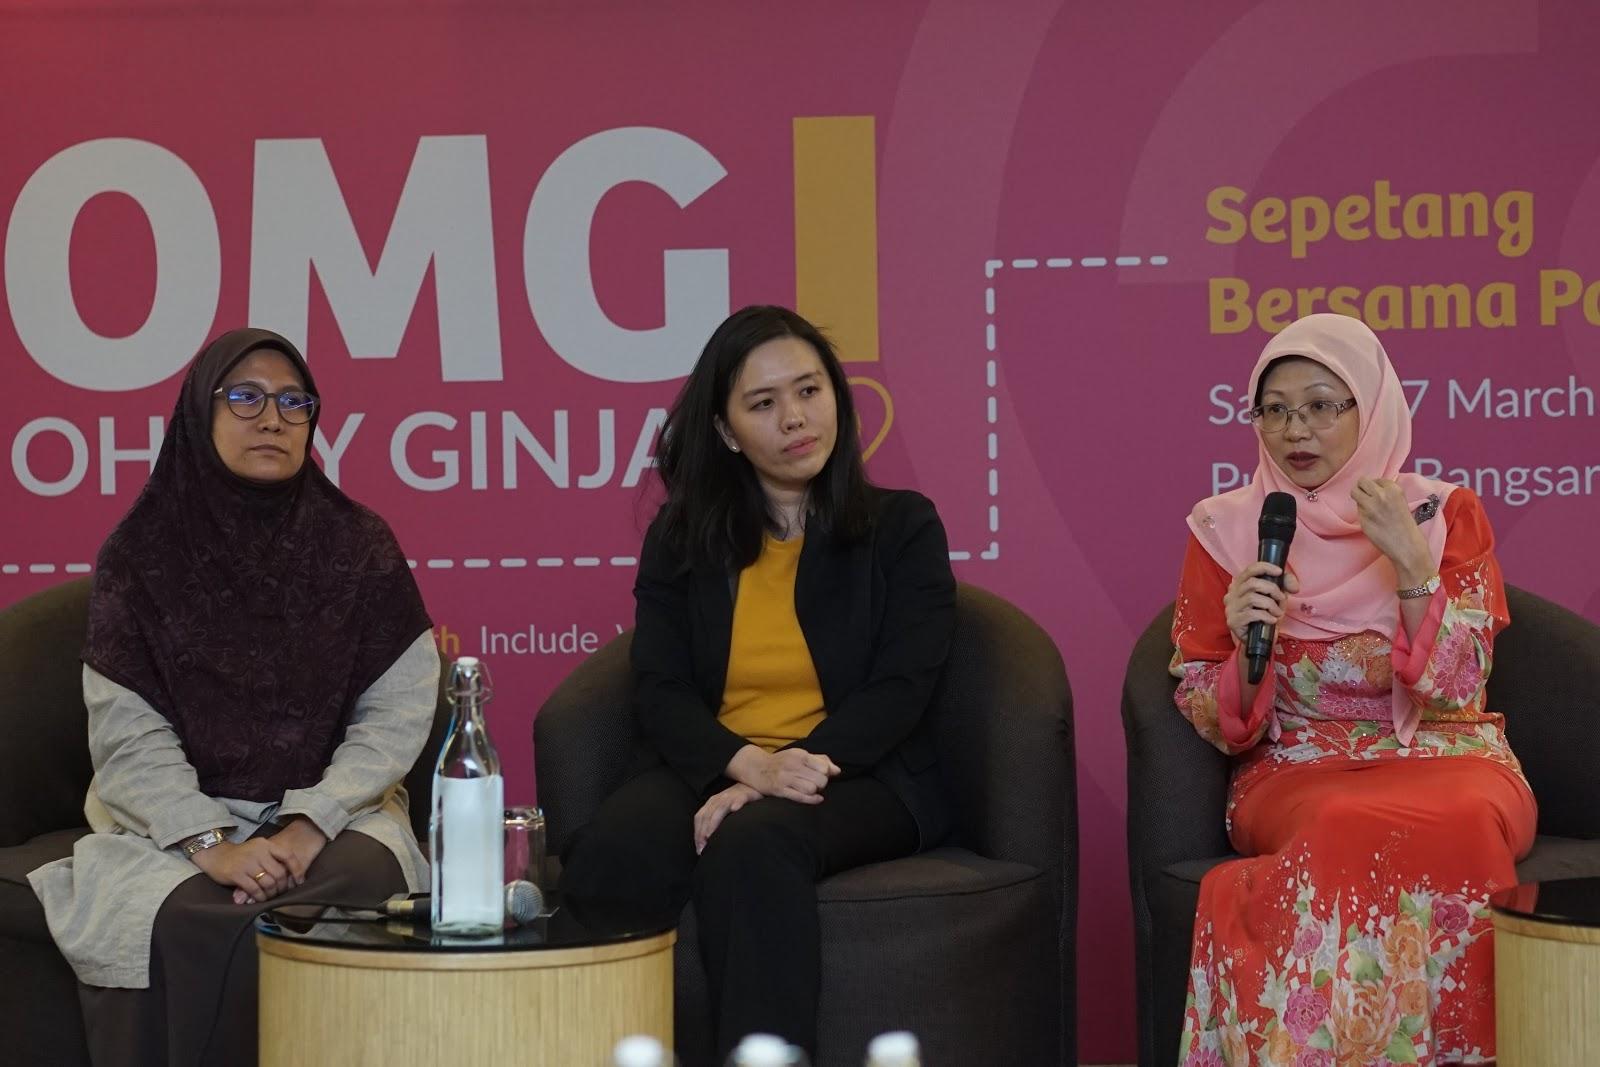 Oh My Ginjal! ~ A Women's Kidney Health Talk